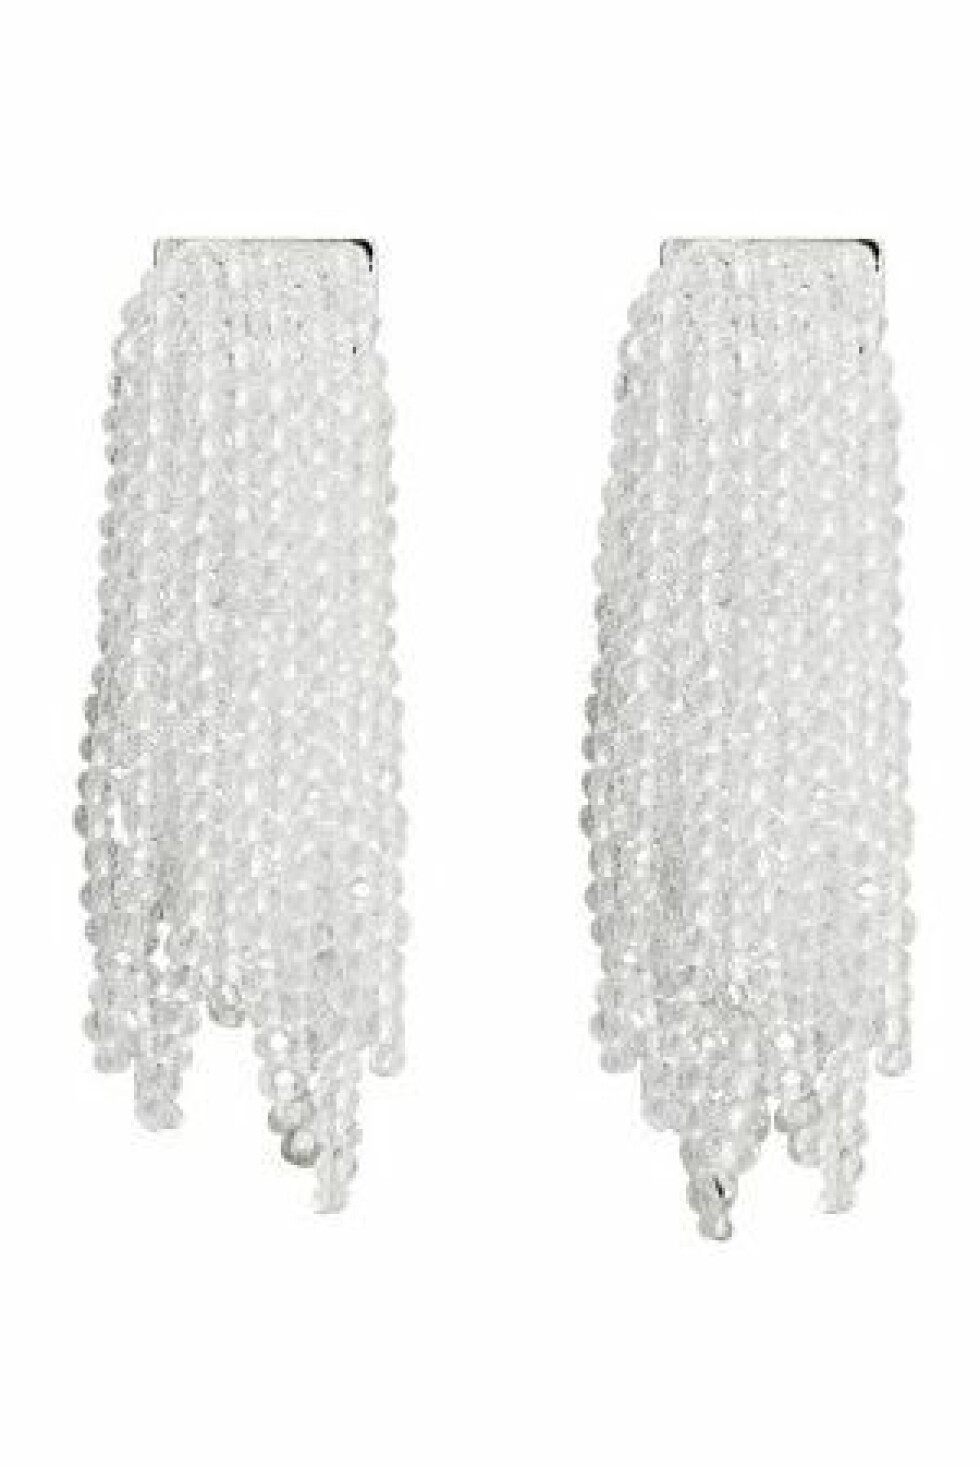 Øredobber fra Mango |84,-| https://shop.mango.com/no-en/women/jewellery-earrings/crystal-beads-earrings_33003029.html?c=01&n=1&s=Rebajas_she.accesorio;48,448